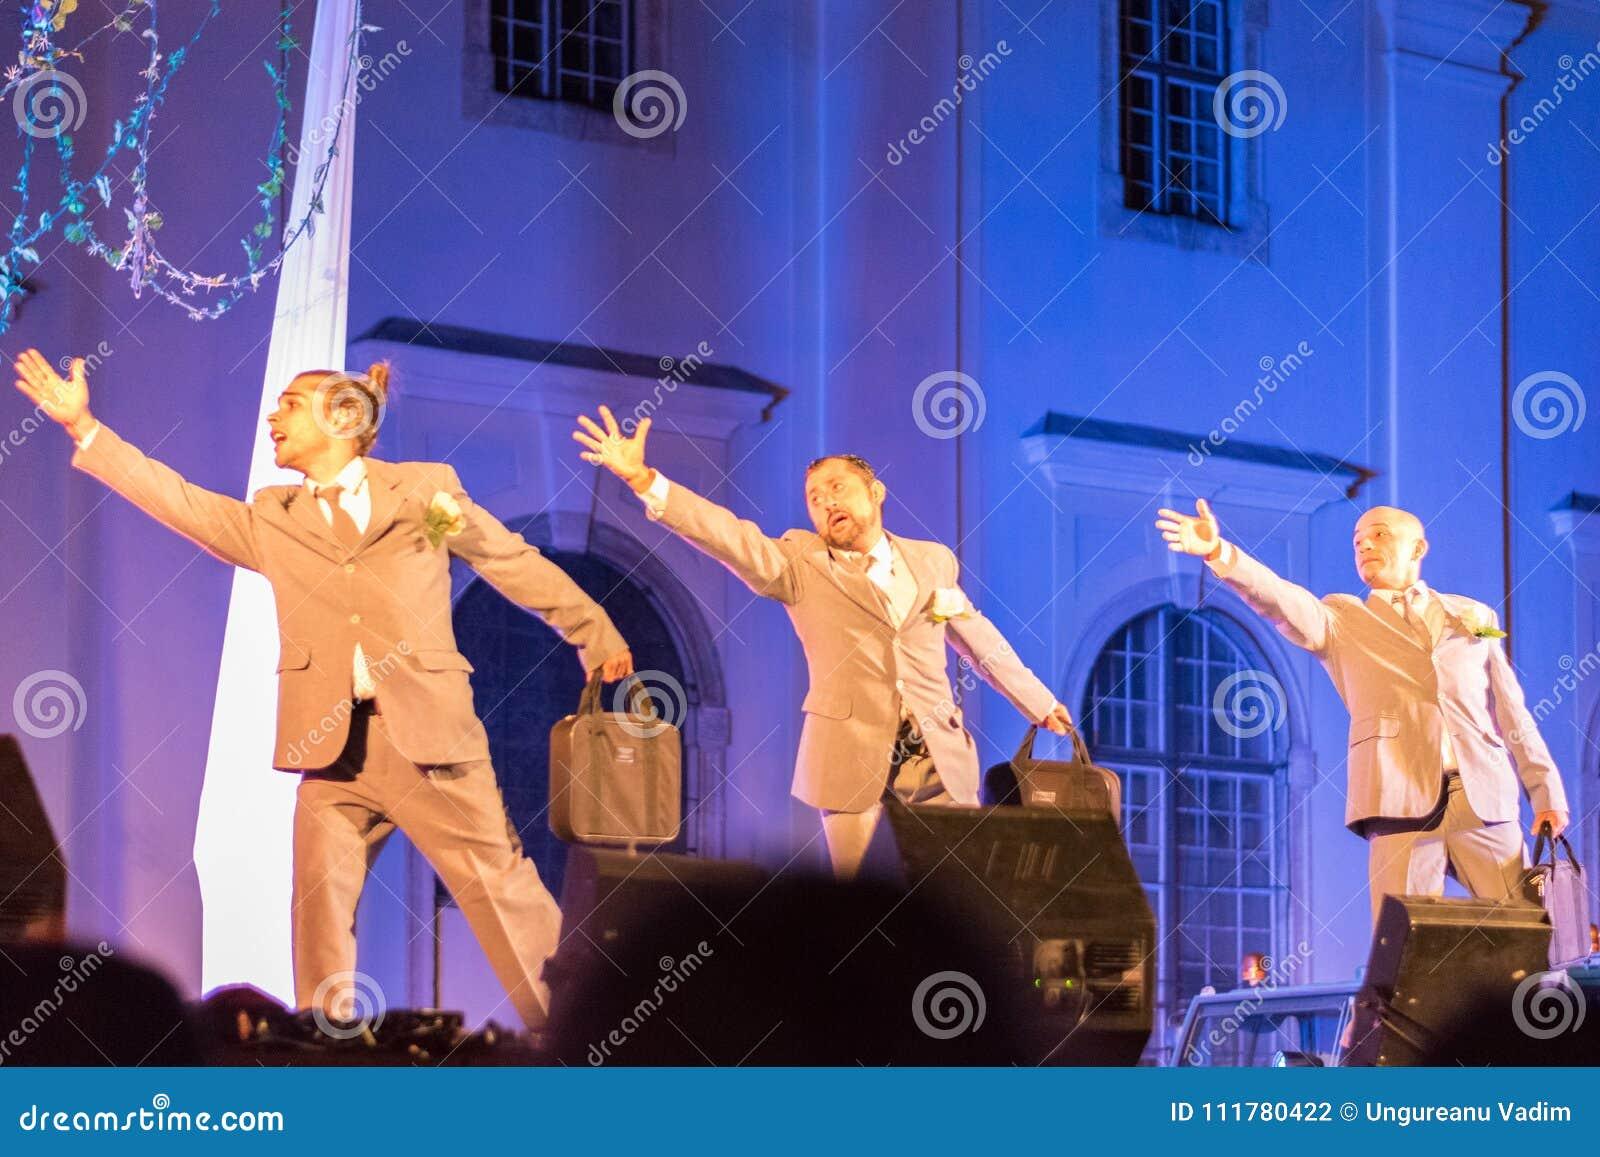 SIBIU, ROMANIA - 17 JUNE 2016: Members of the VOALA Station performing in the Big Square, during Sibiu International Theatre Festi